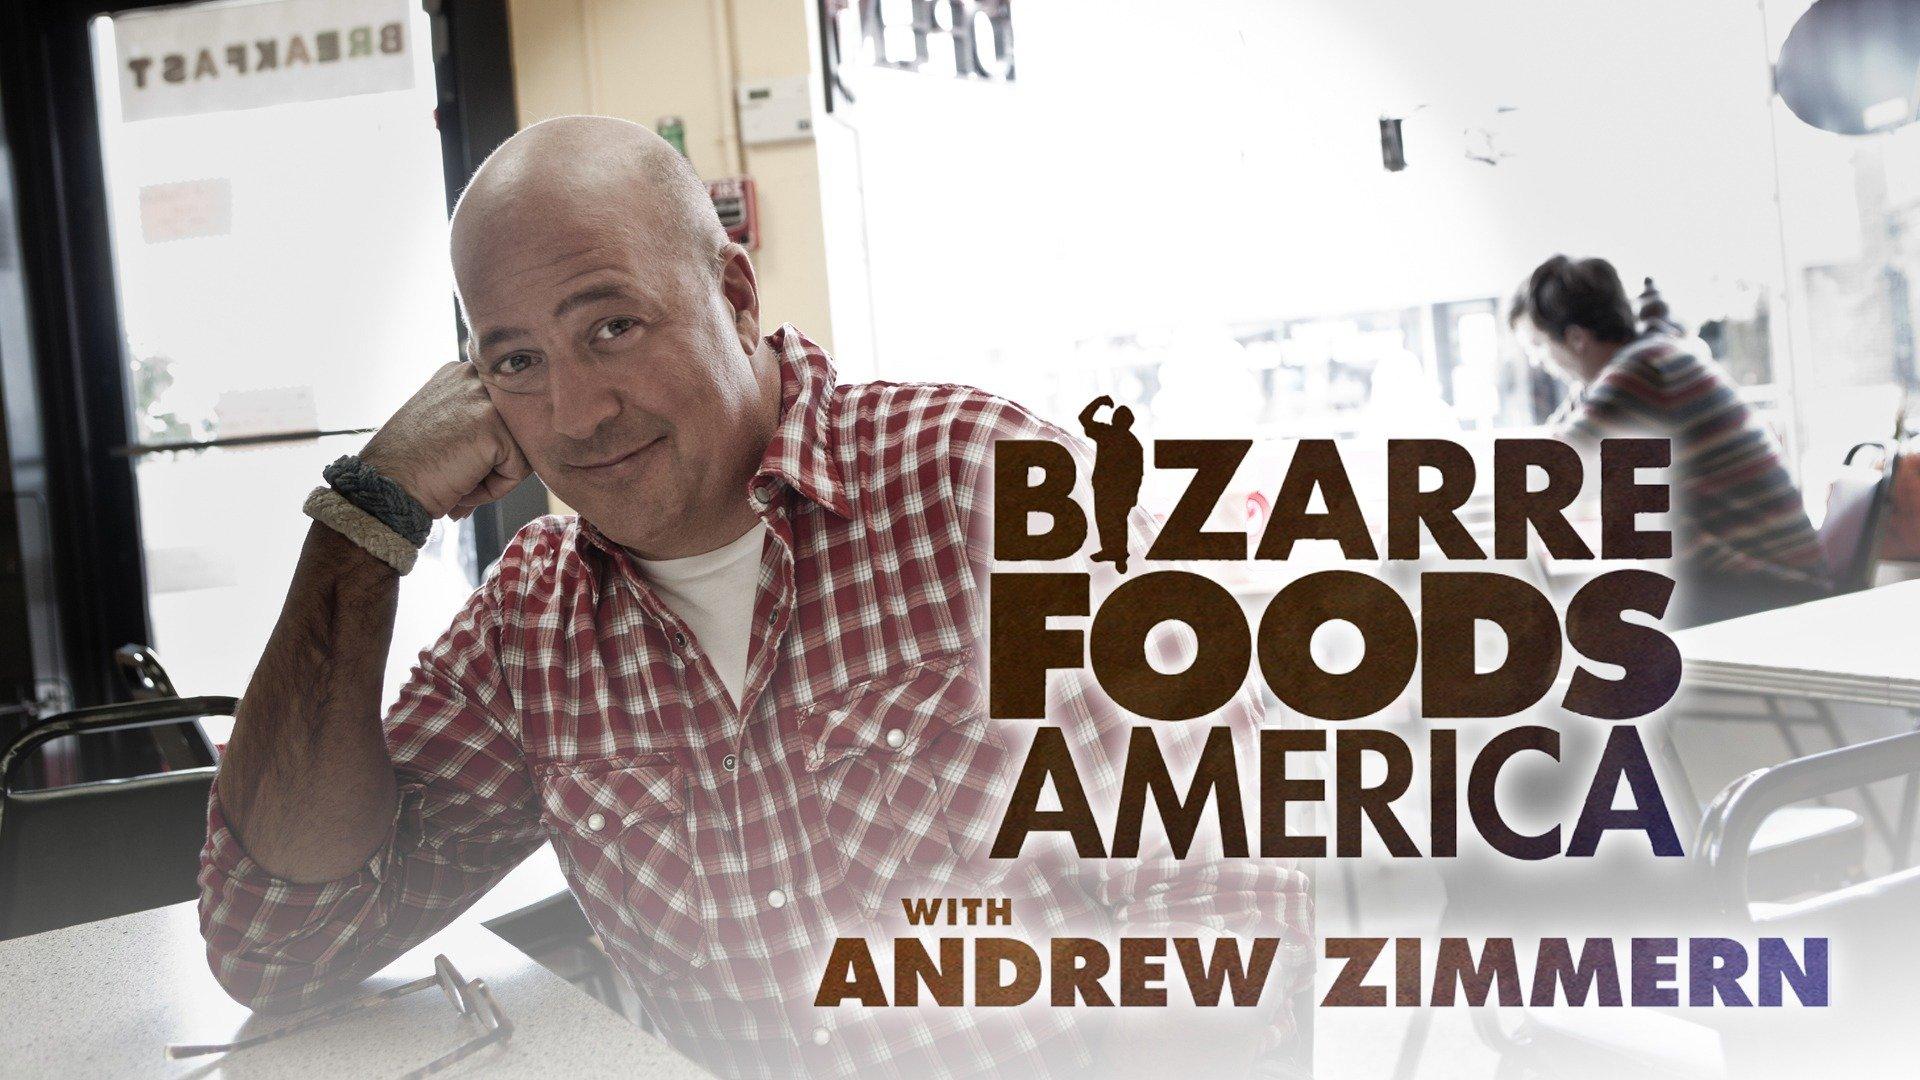 Bizarre Foods America